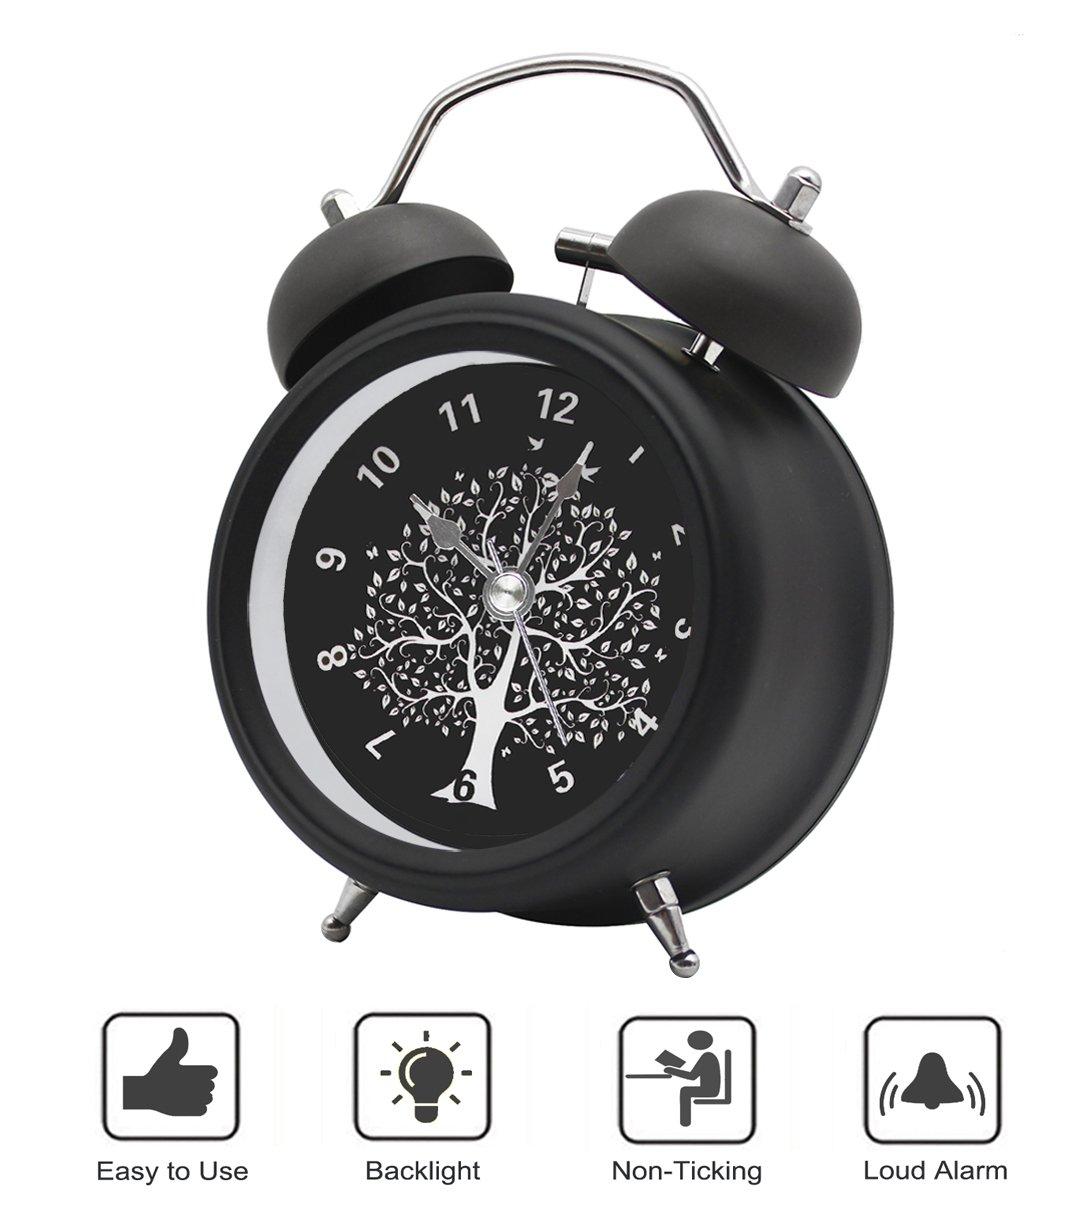 BESTWYA Twin Bell Alarm Clock,Quartz Alarm Clock with Loud Alarm Cute Appearance Backlight Silent Ticking Battery Operated Loud Alarm Clocks for Heavy Sleepers (Black,Wishing Tree)